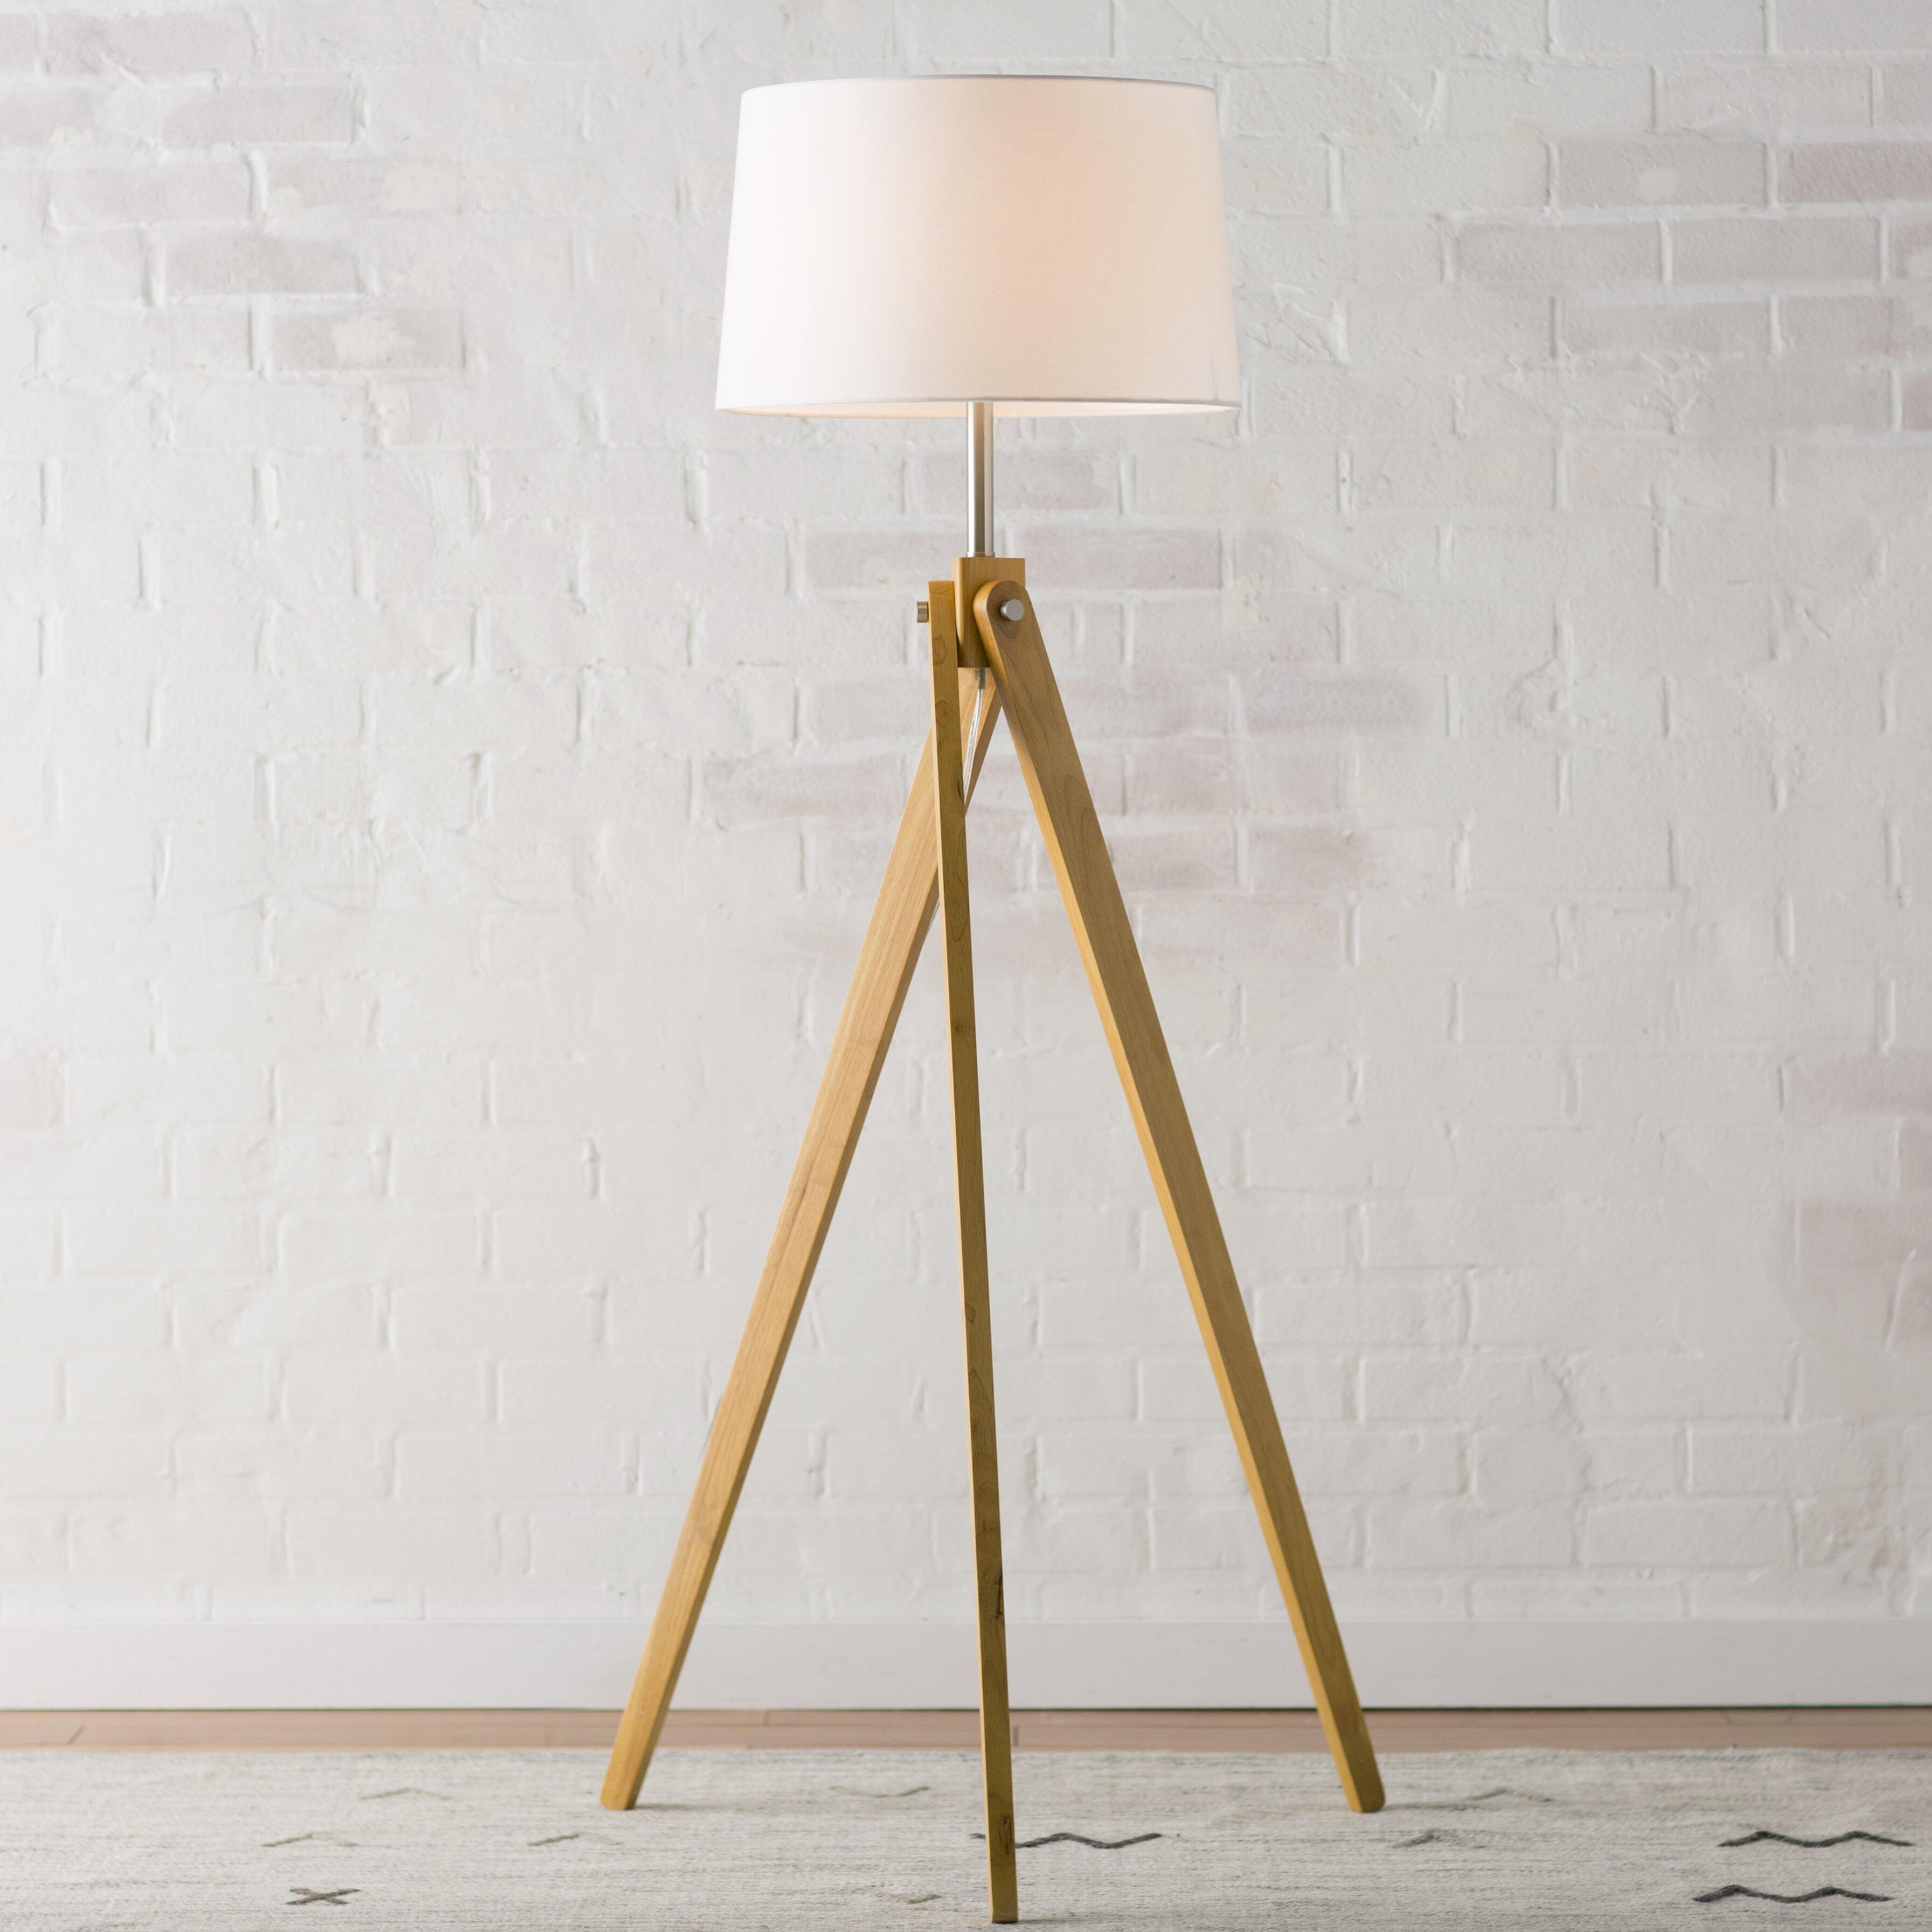 lighting lamps contemporary floor lamps langley street sku. Black Bedroom Furniture Sets. Home Design Ideas